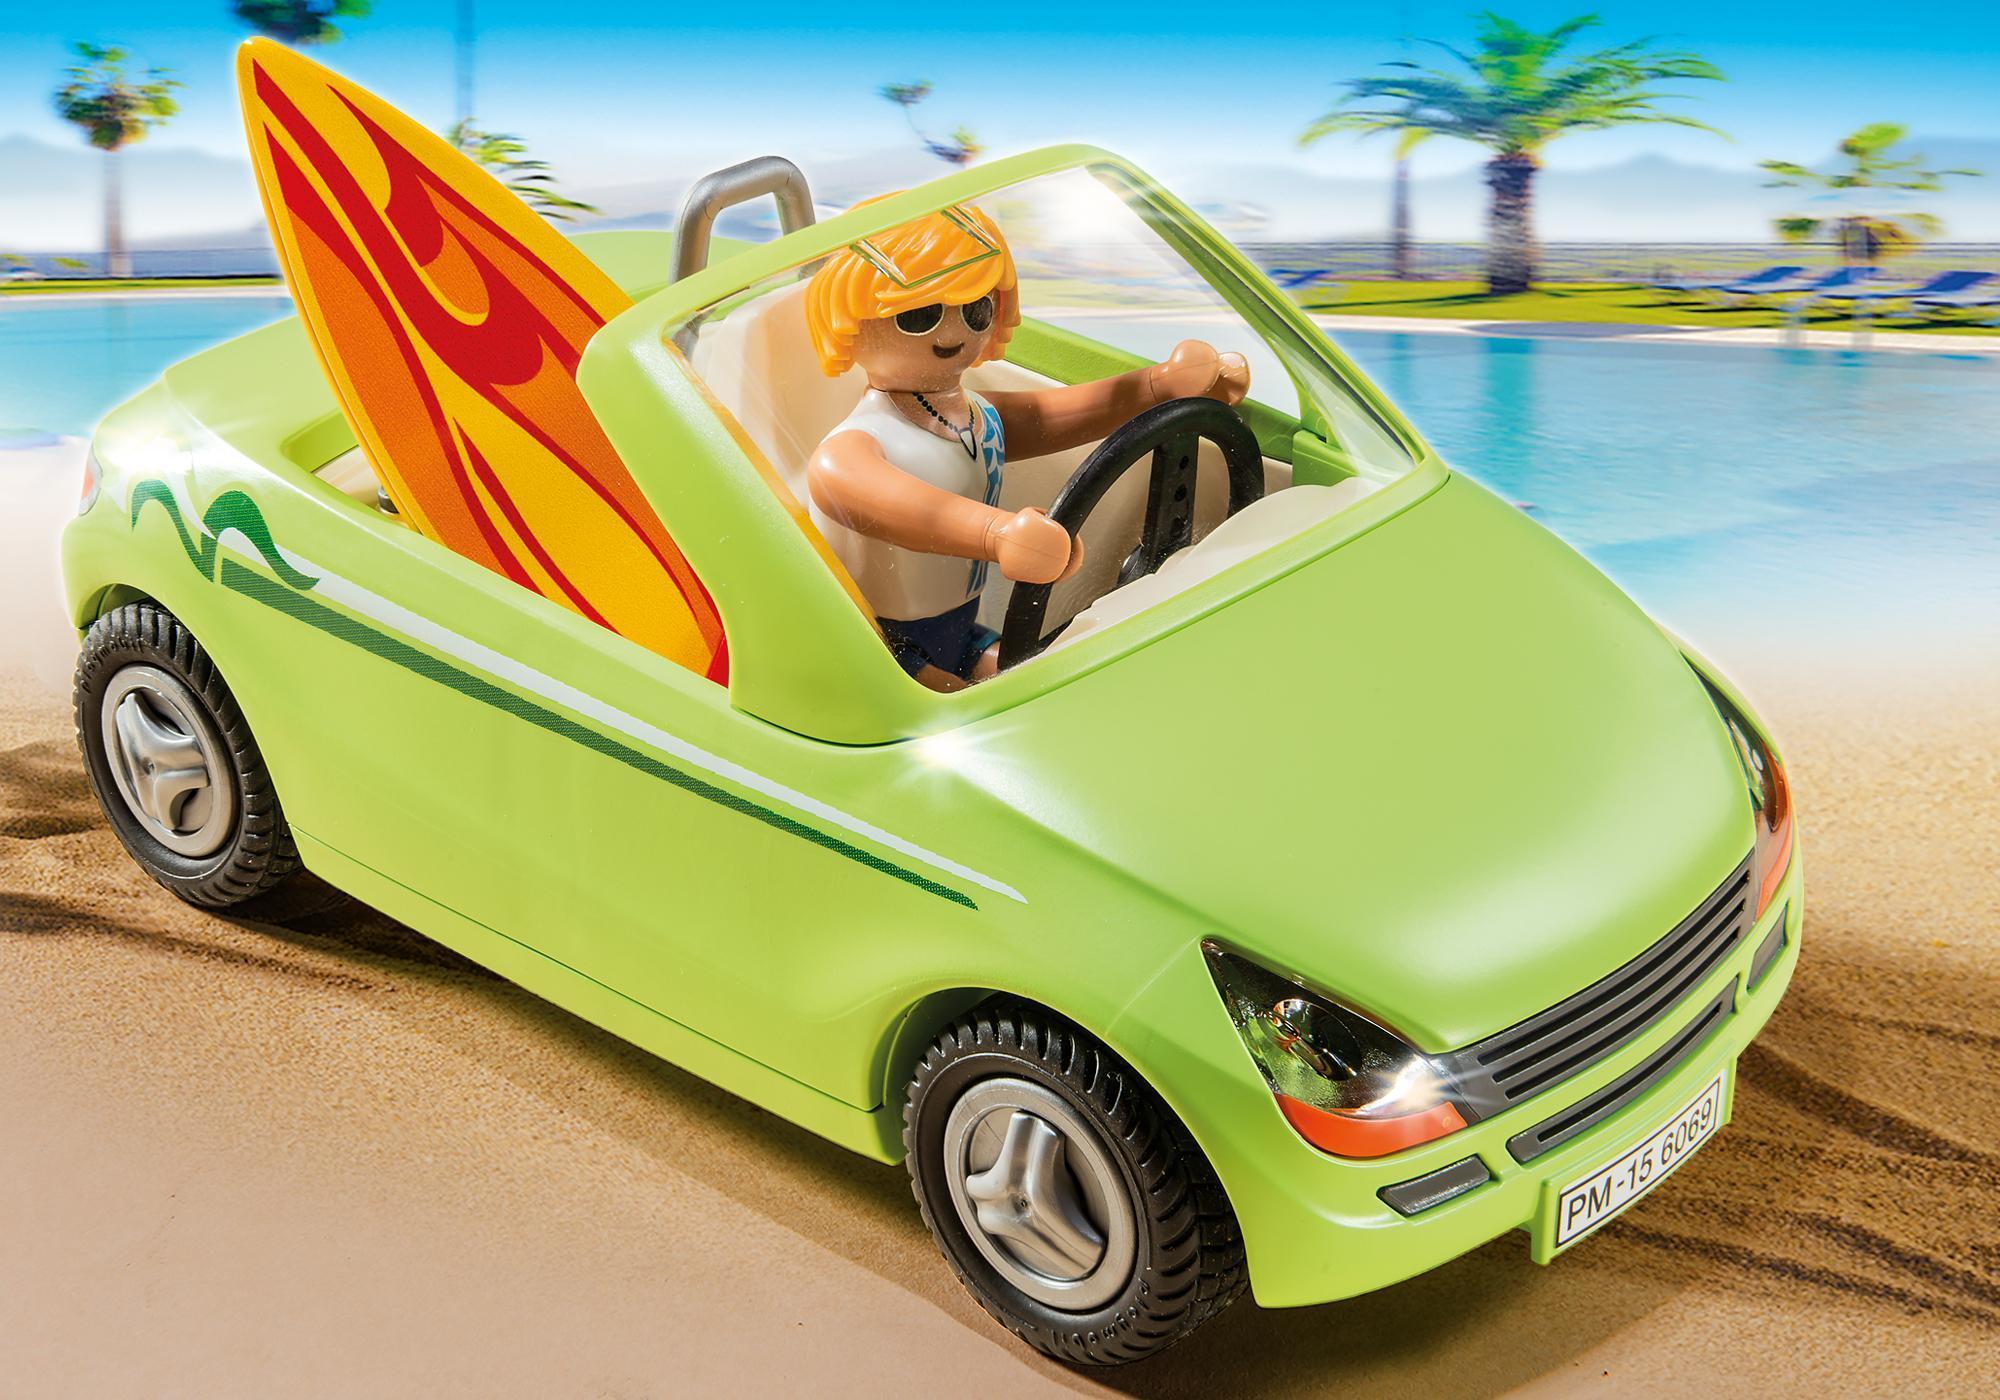 http://media.playmobil.com/i/playmobil/6069_product_extra1